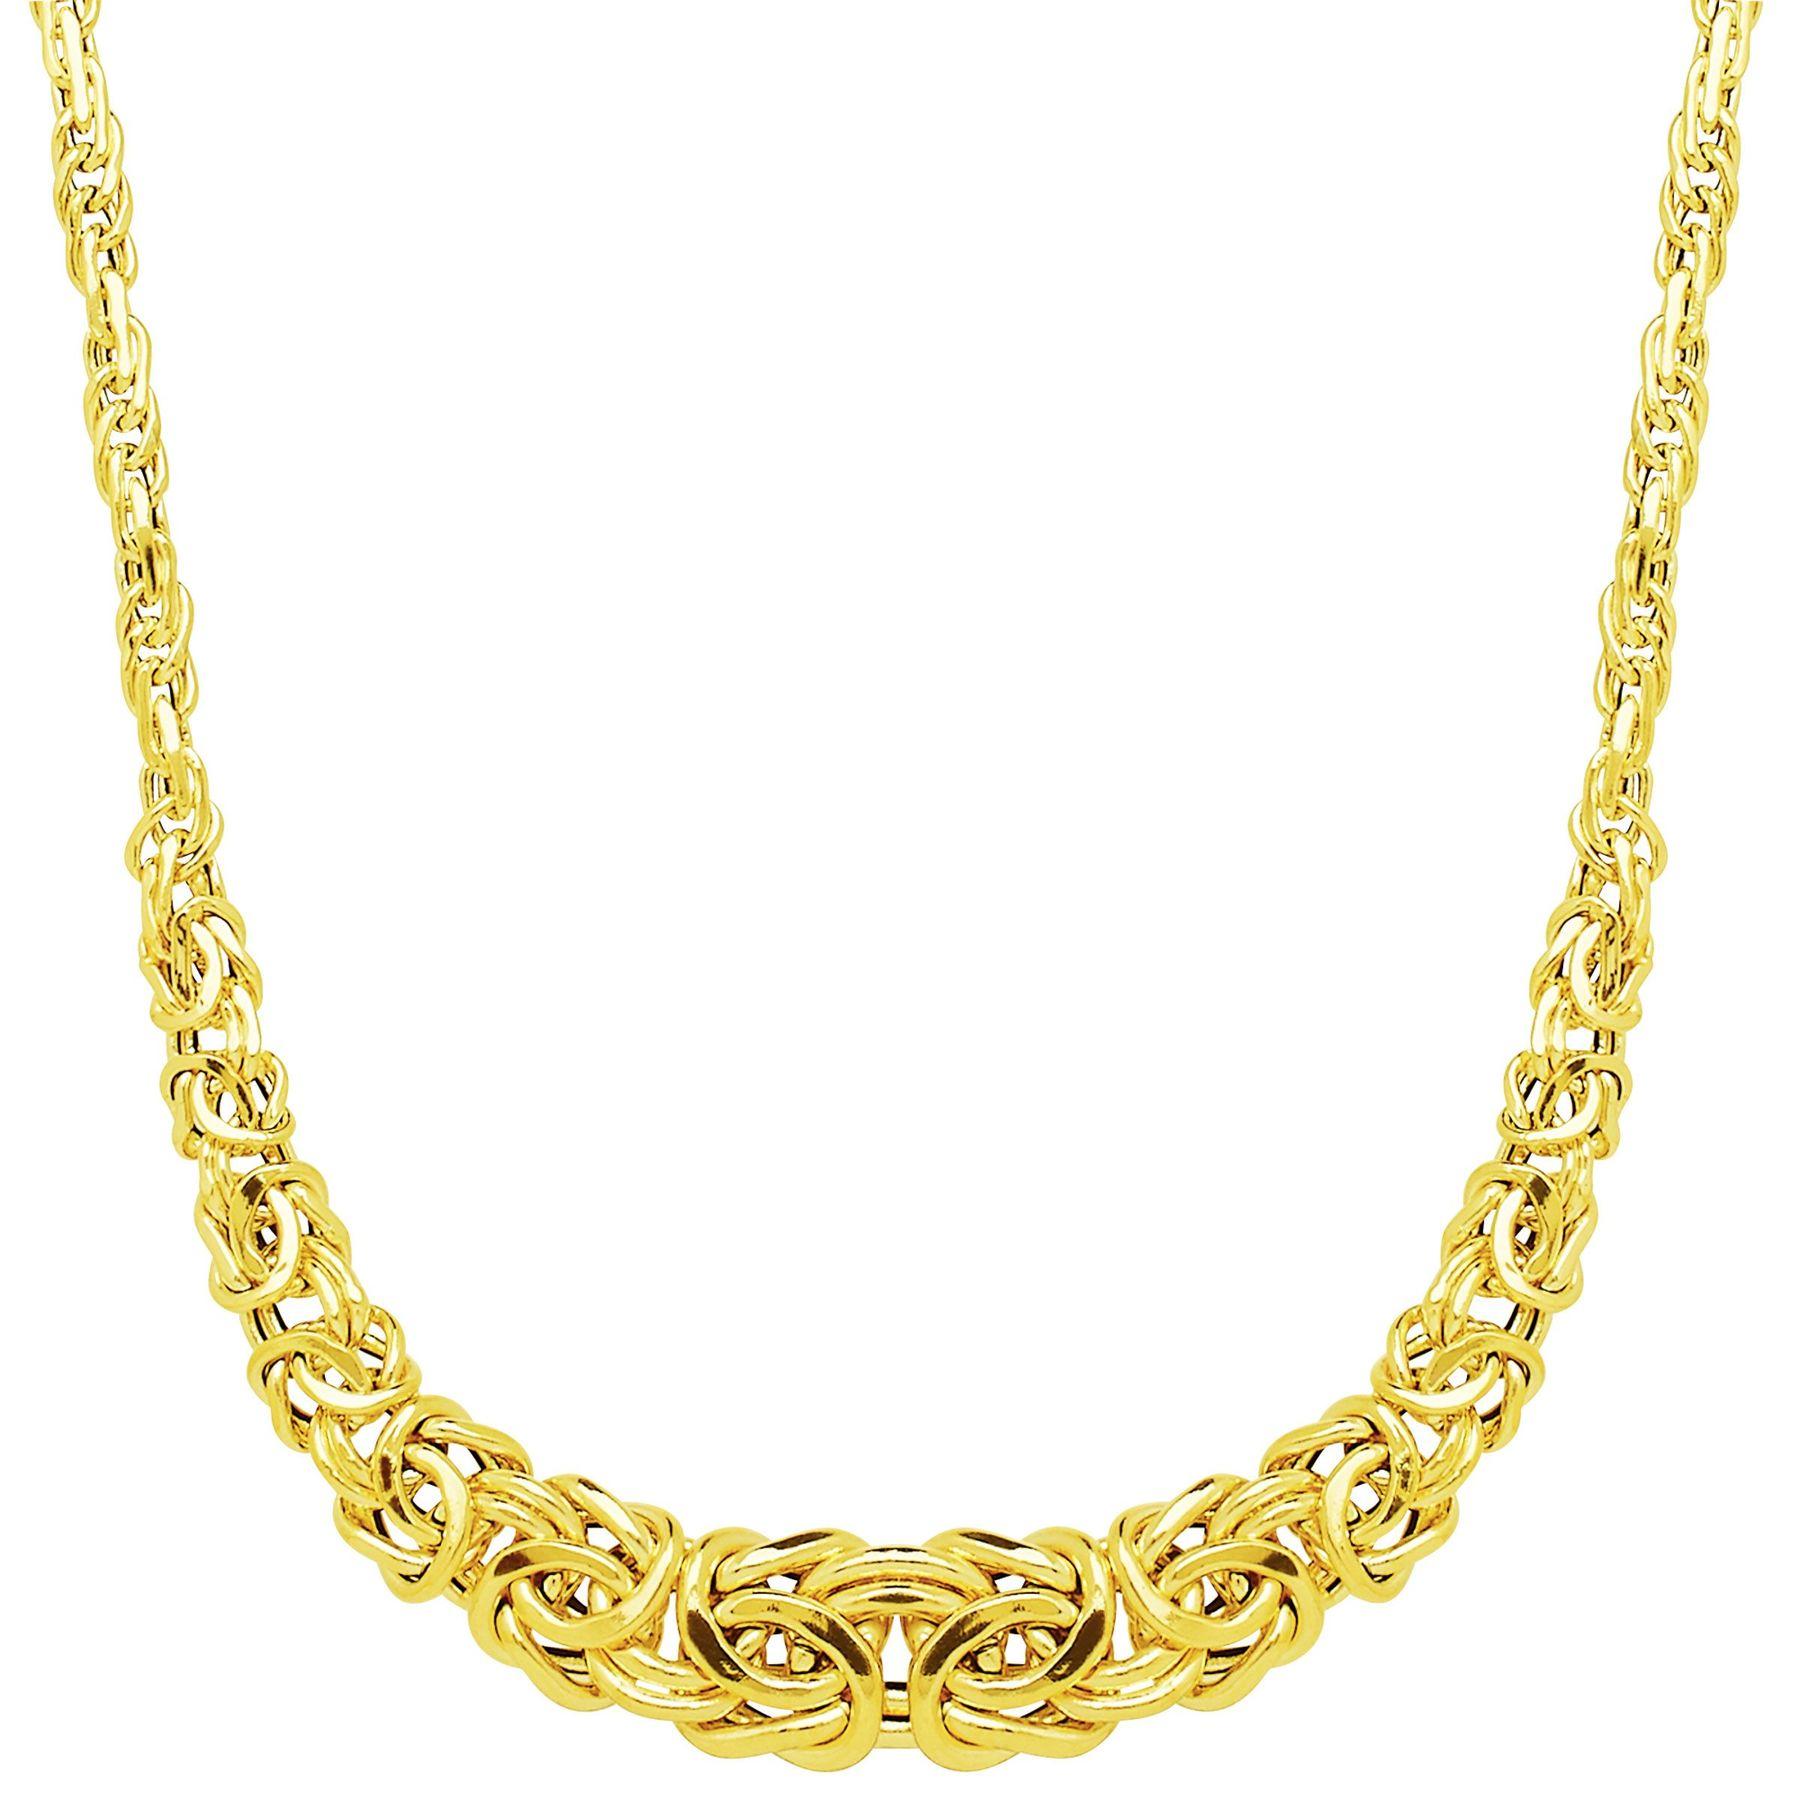 Gold Jewelry | Jewelry.com